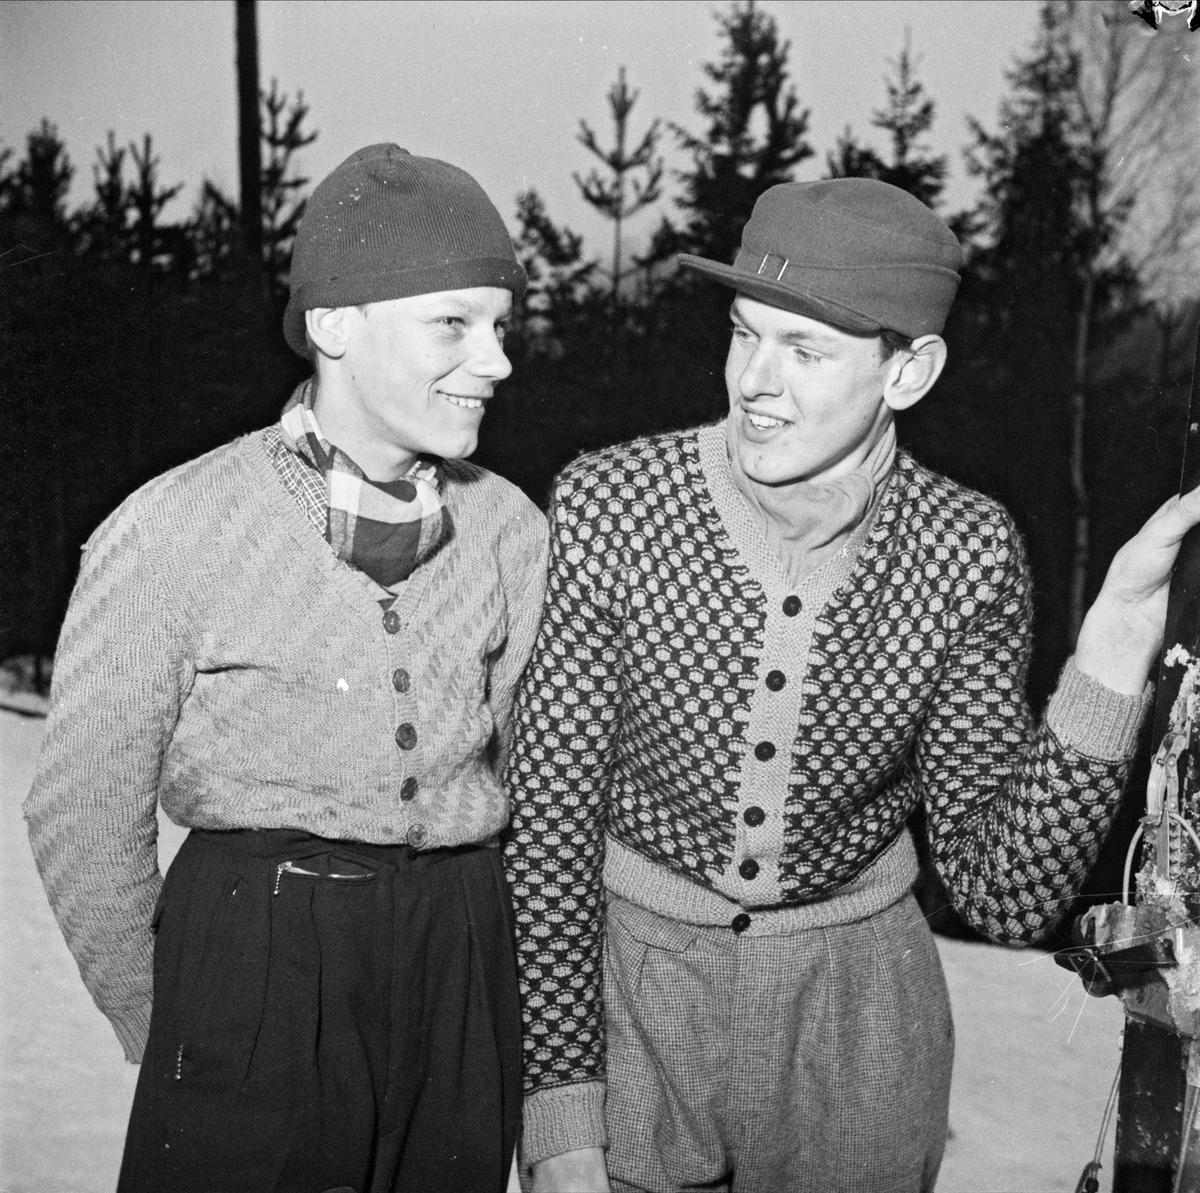 Backhoppning i Sunnerstabacken, Uppsala januari 1950